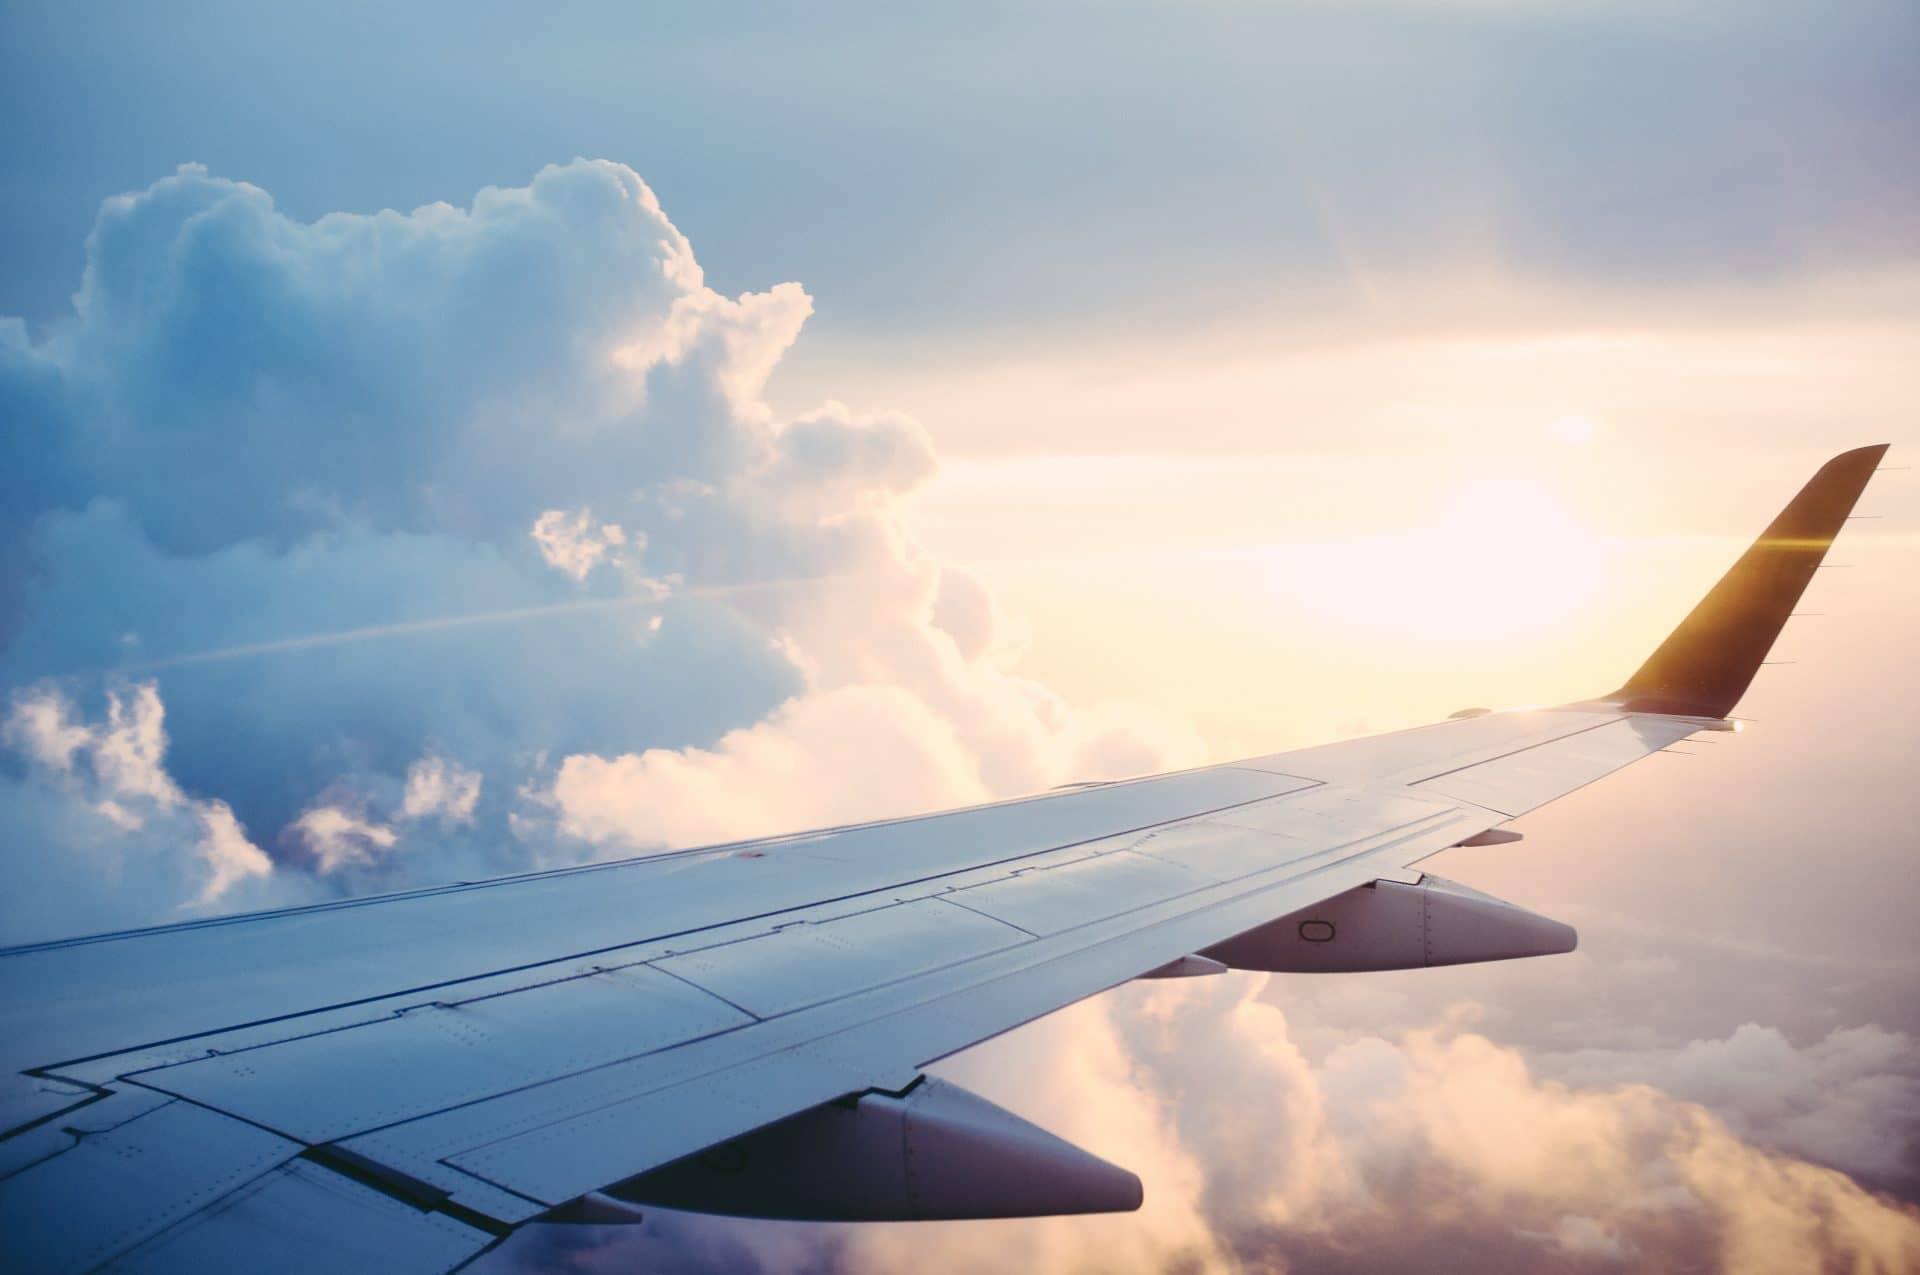 Plane in flight - Fly back to UK